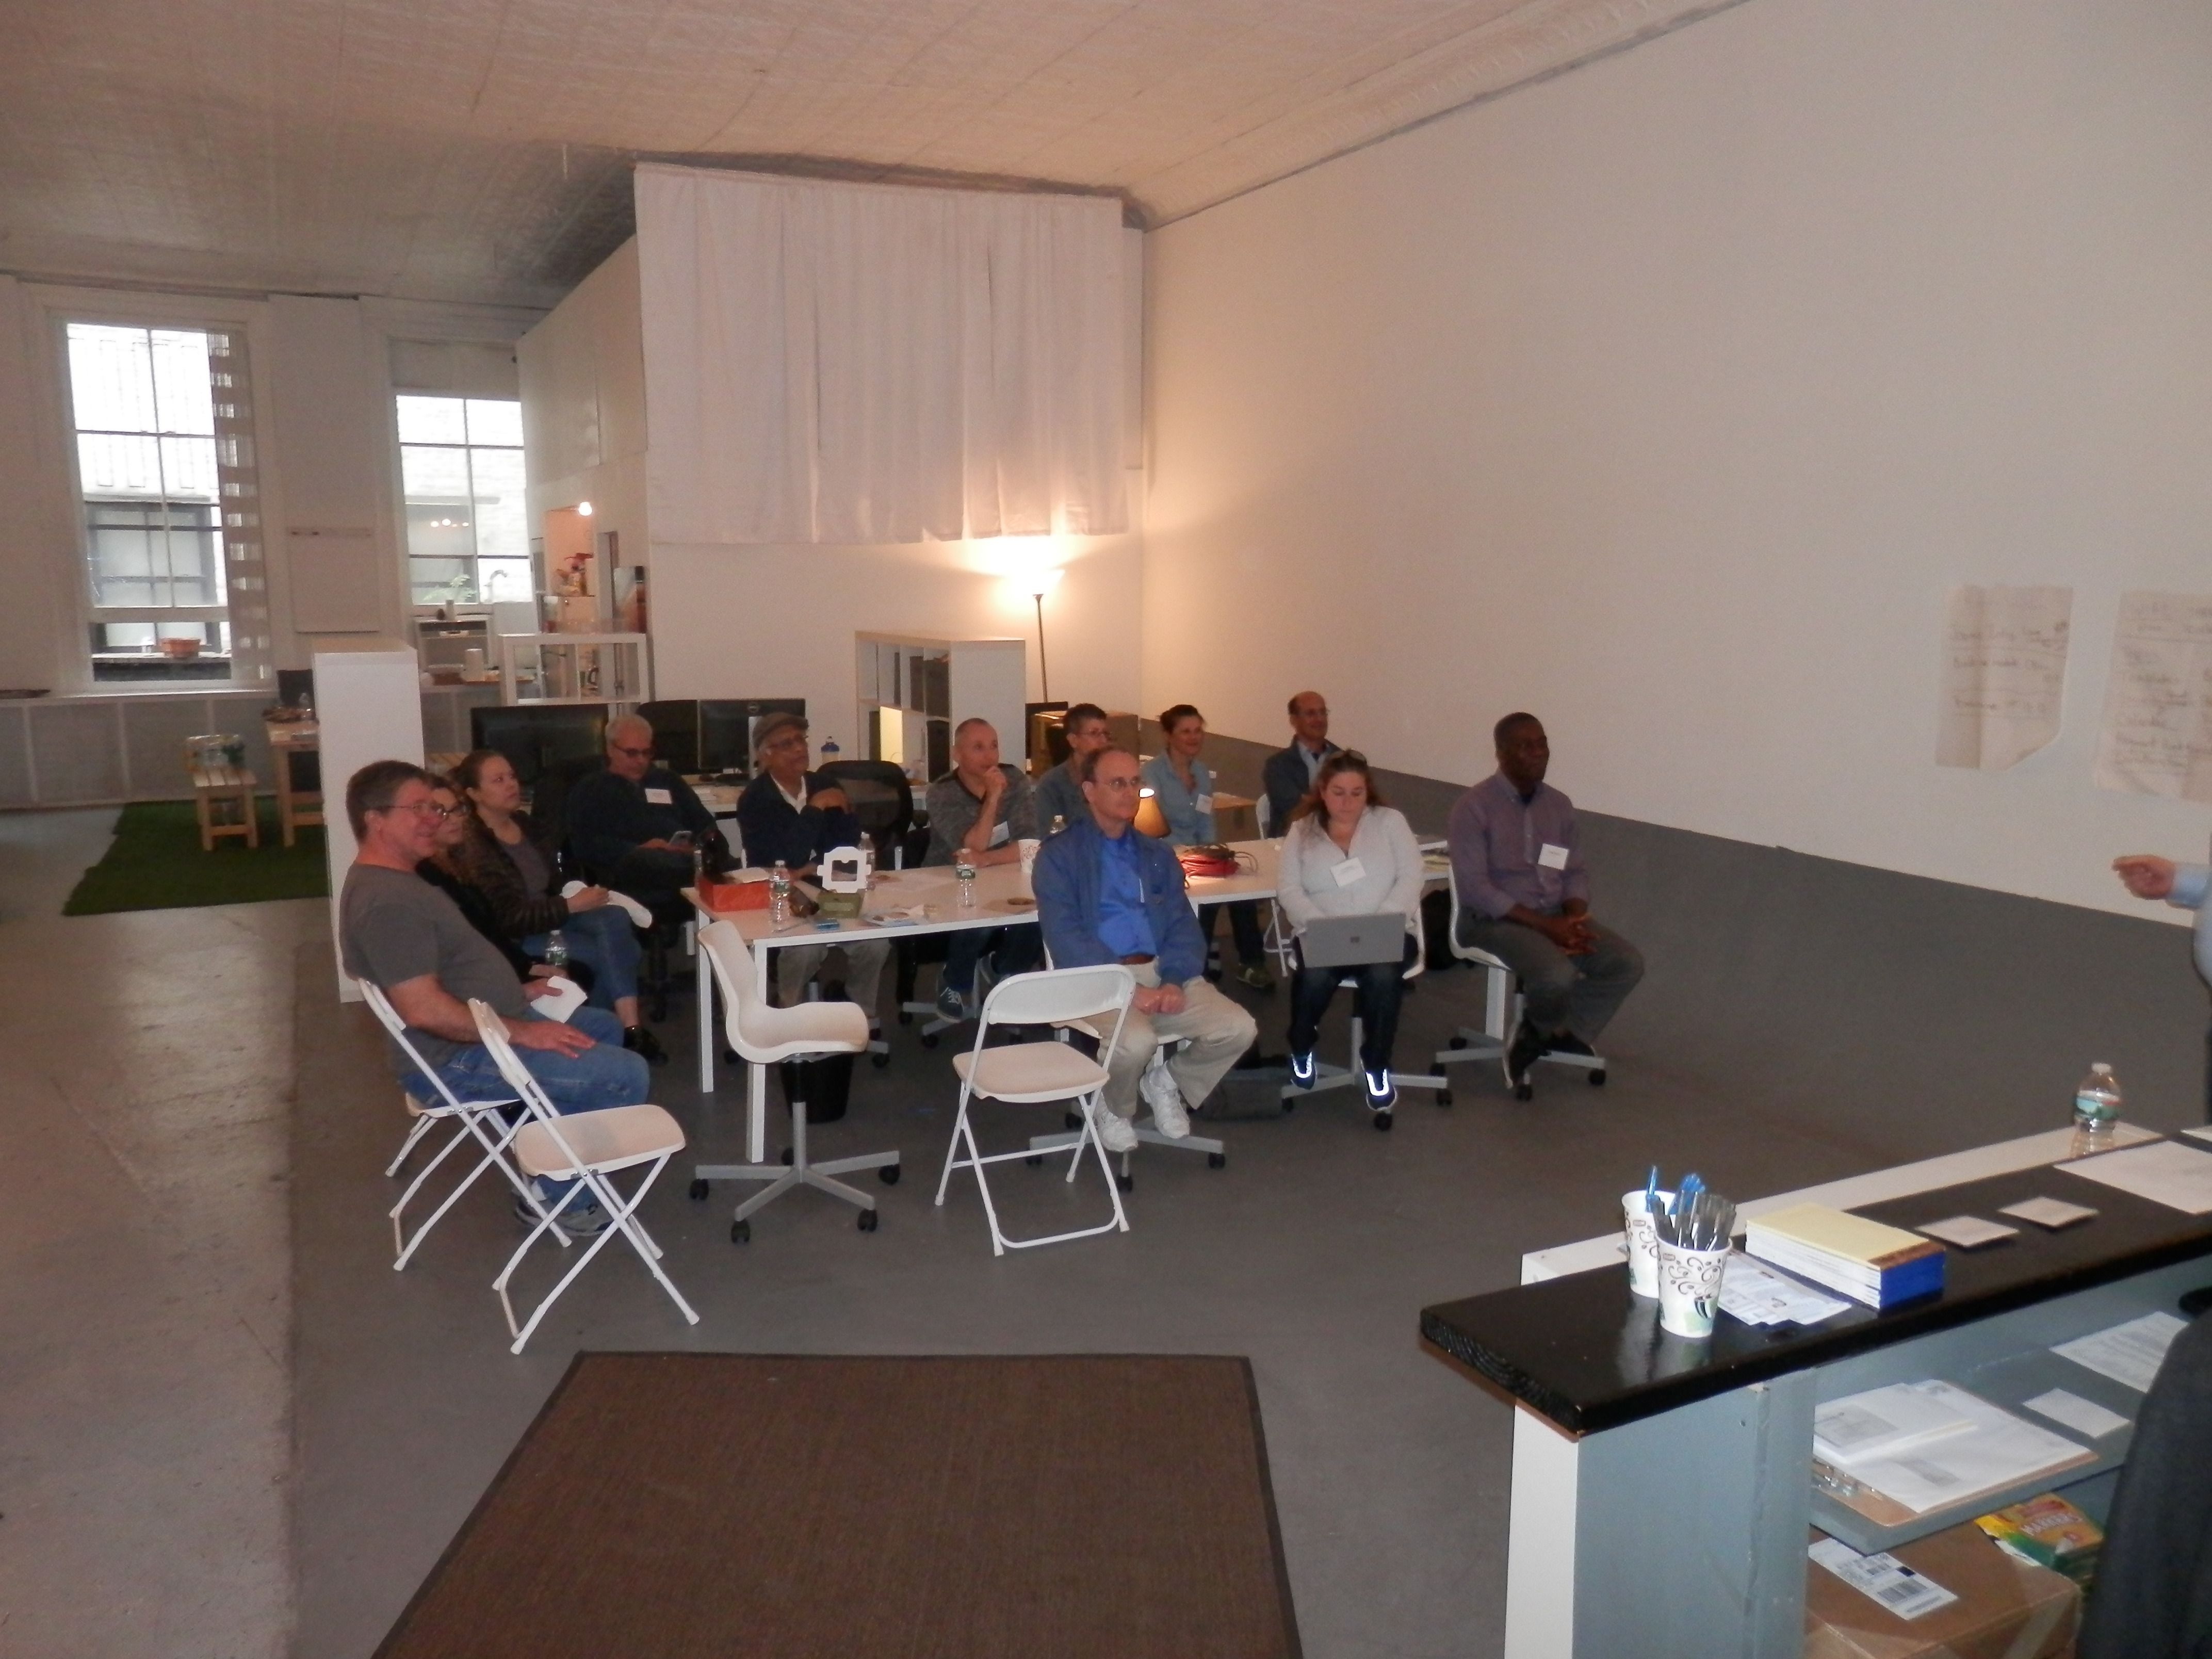 Joomla Users Group of New Jersey